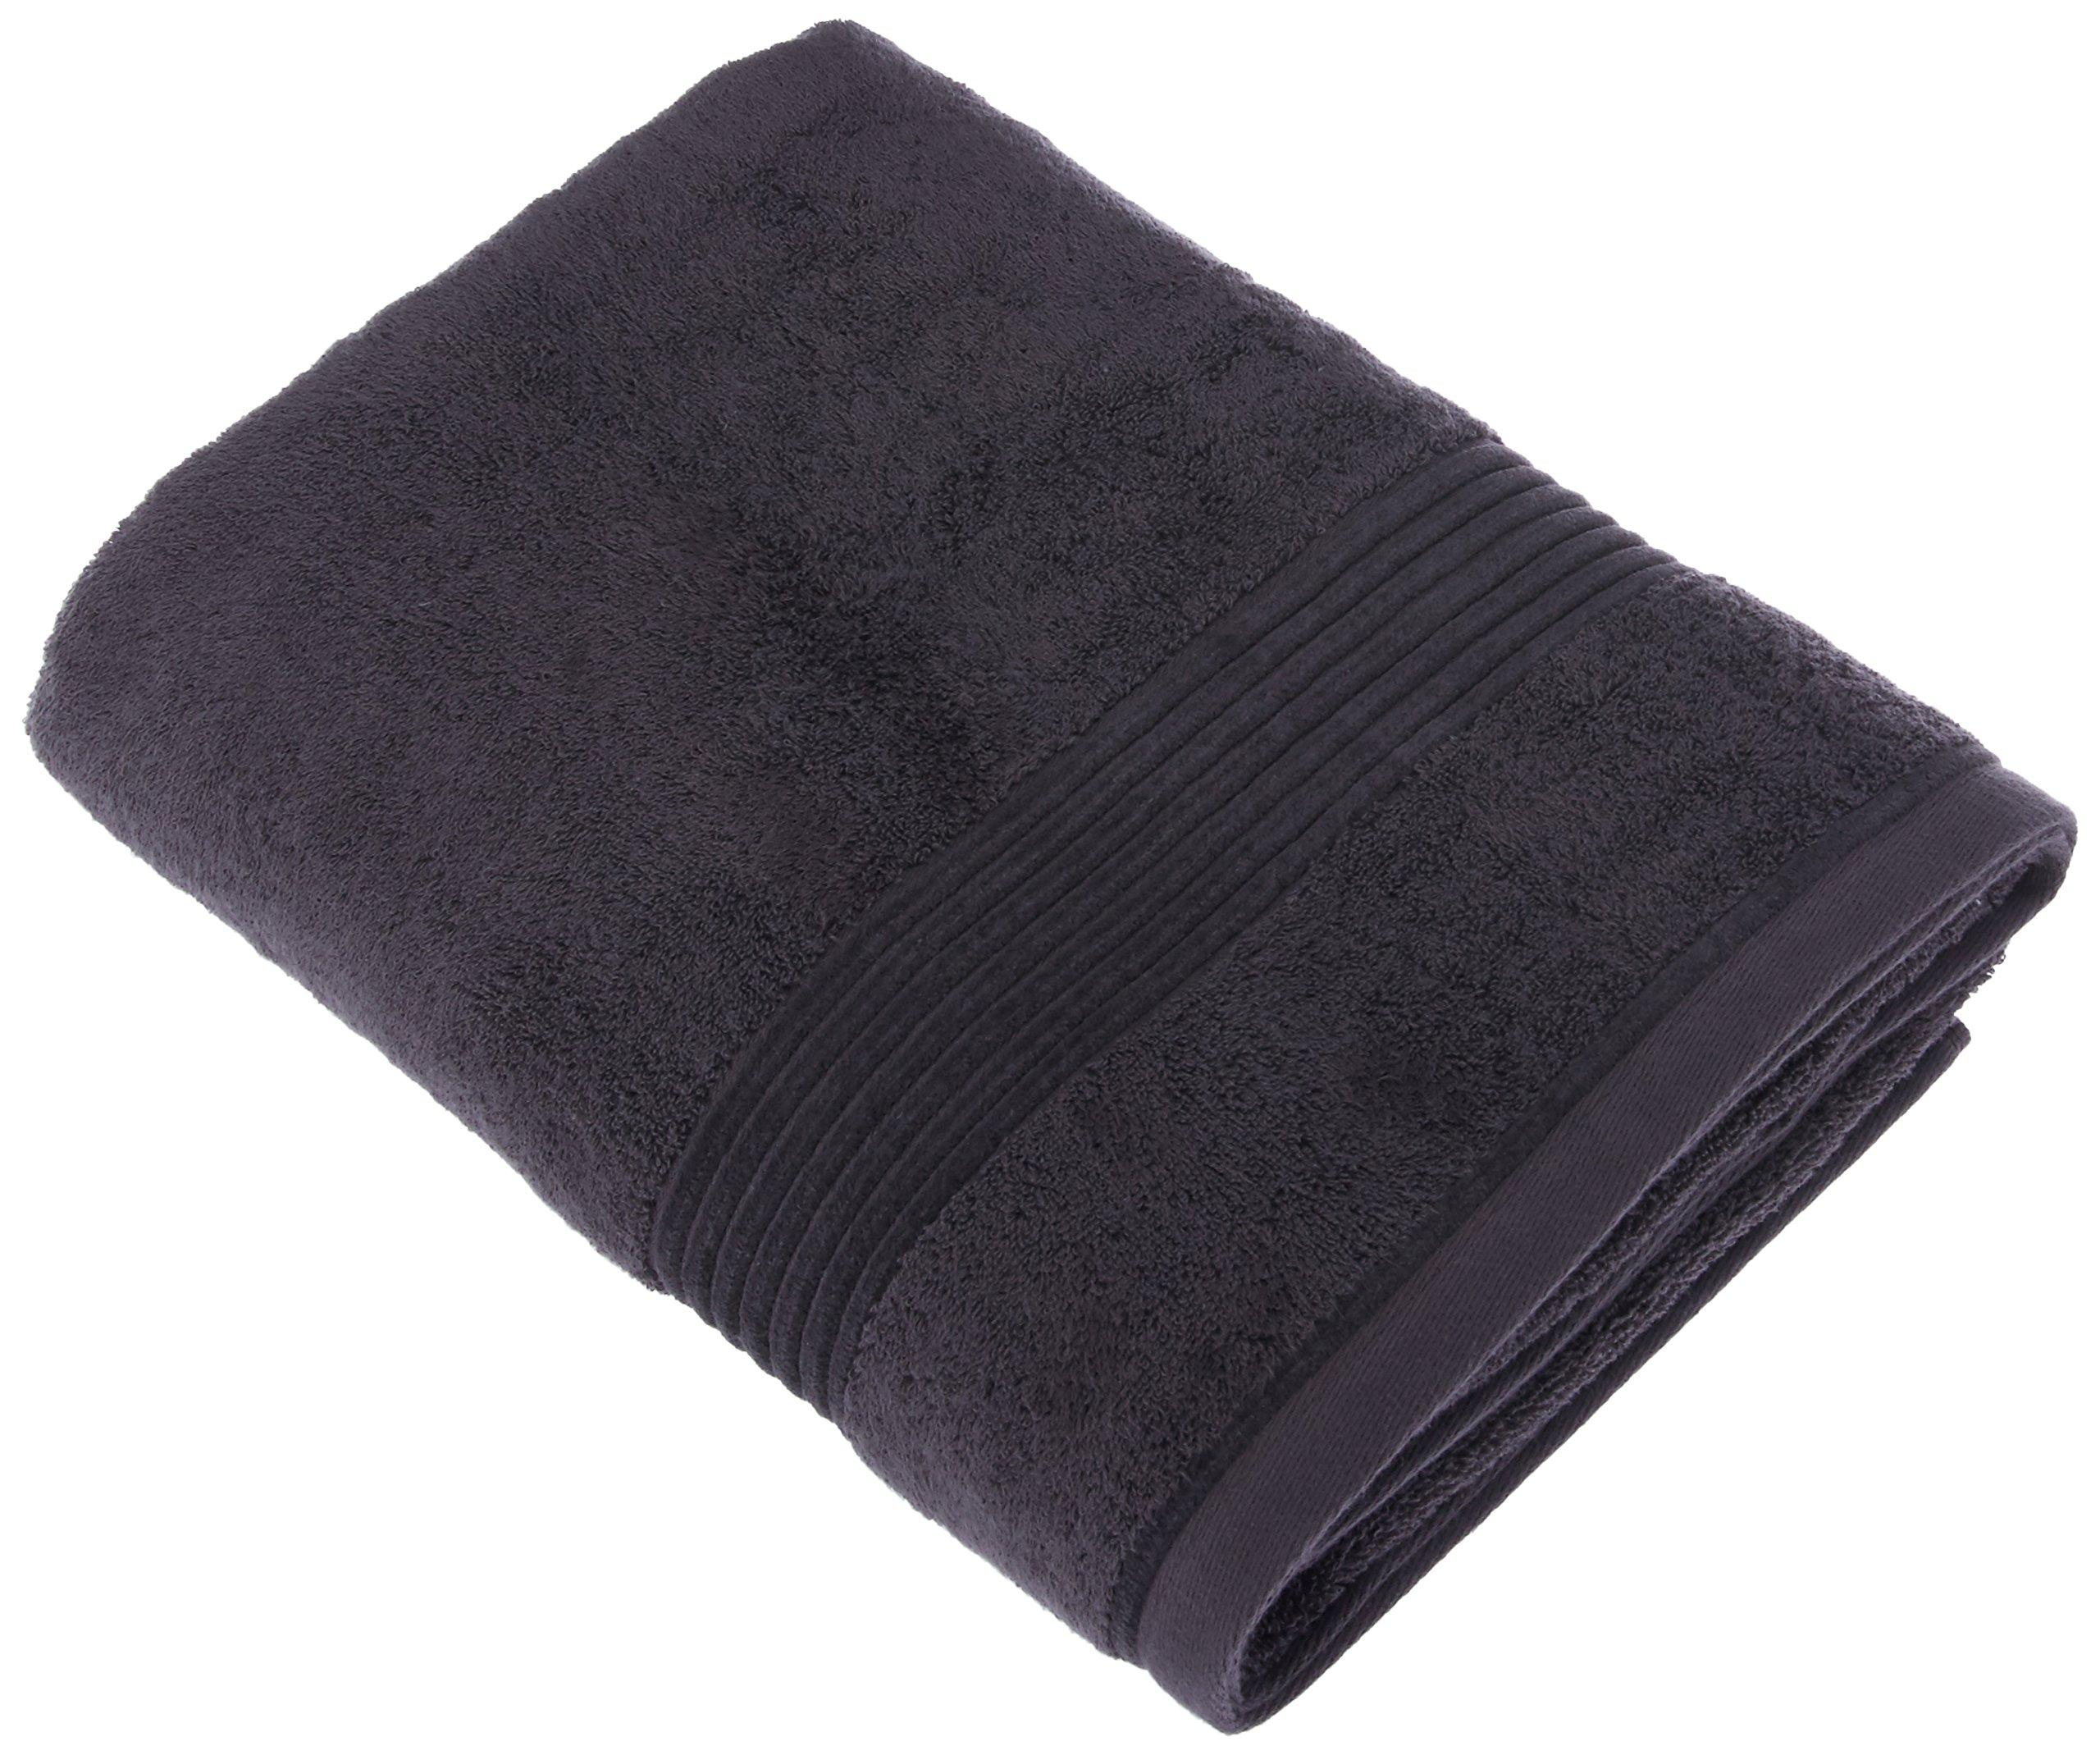 Chortex Ultimate Zero Twist, 100% Cotton Bath Sheet (Pack of 2), 35'' x 68'', Charcoal